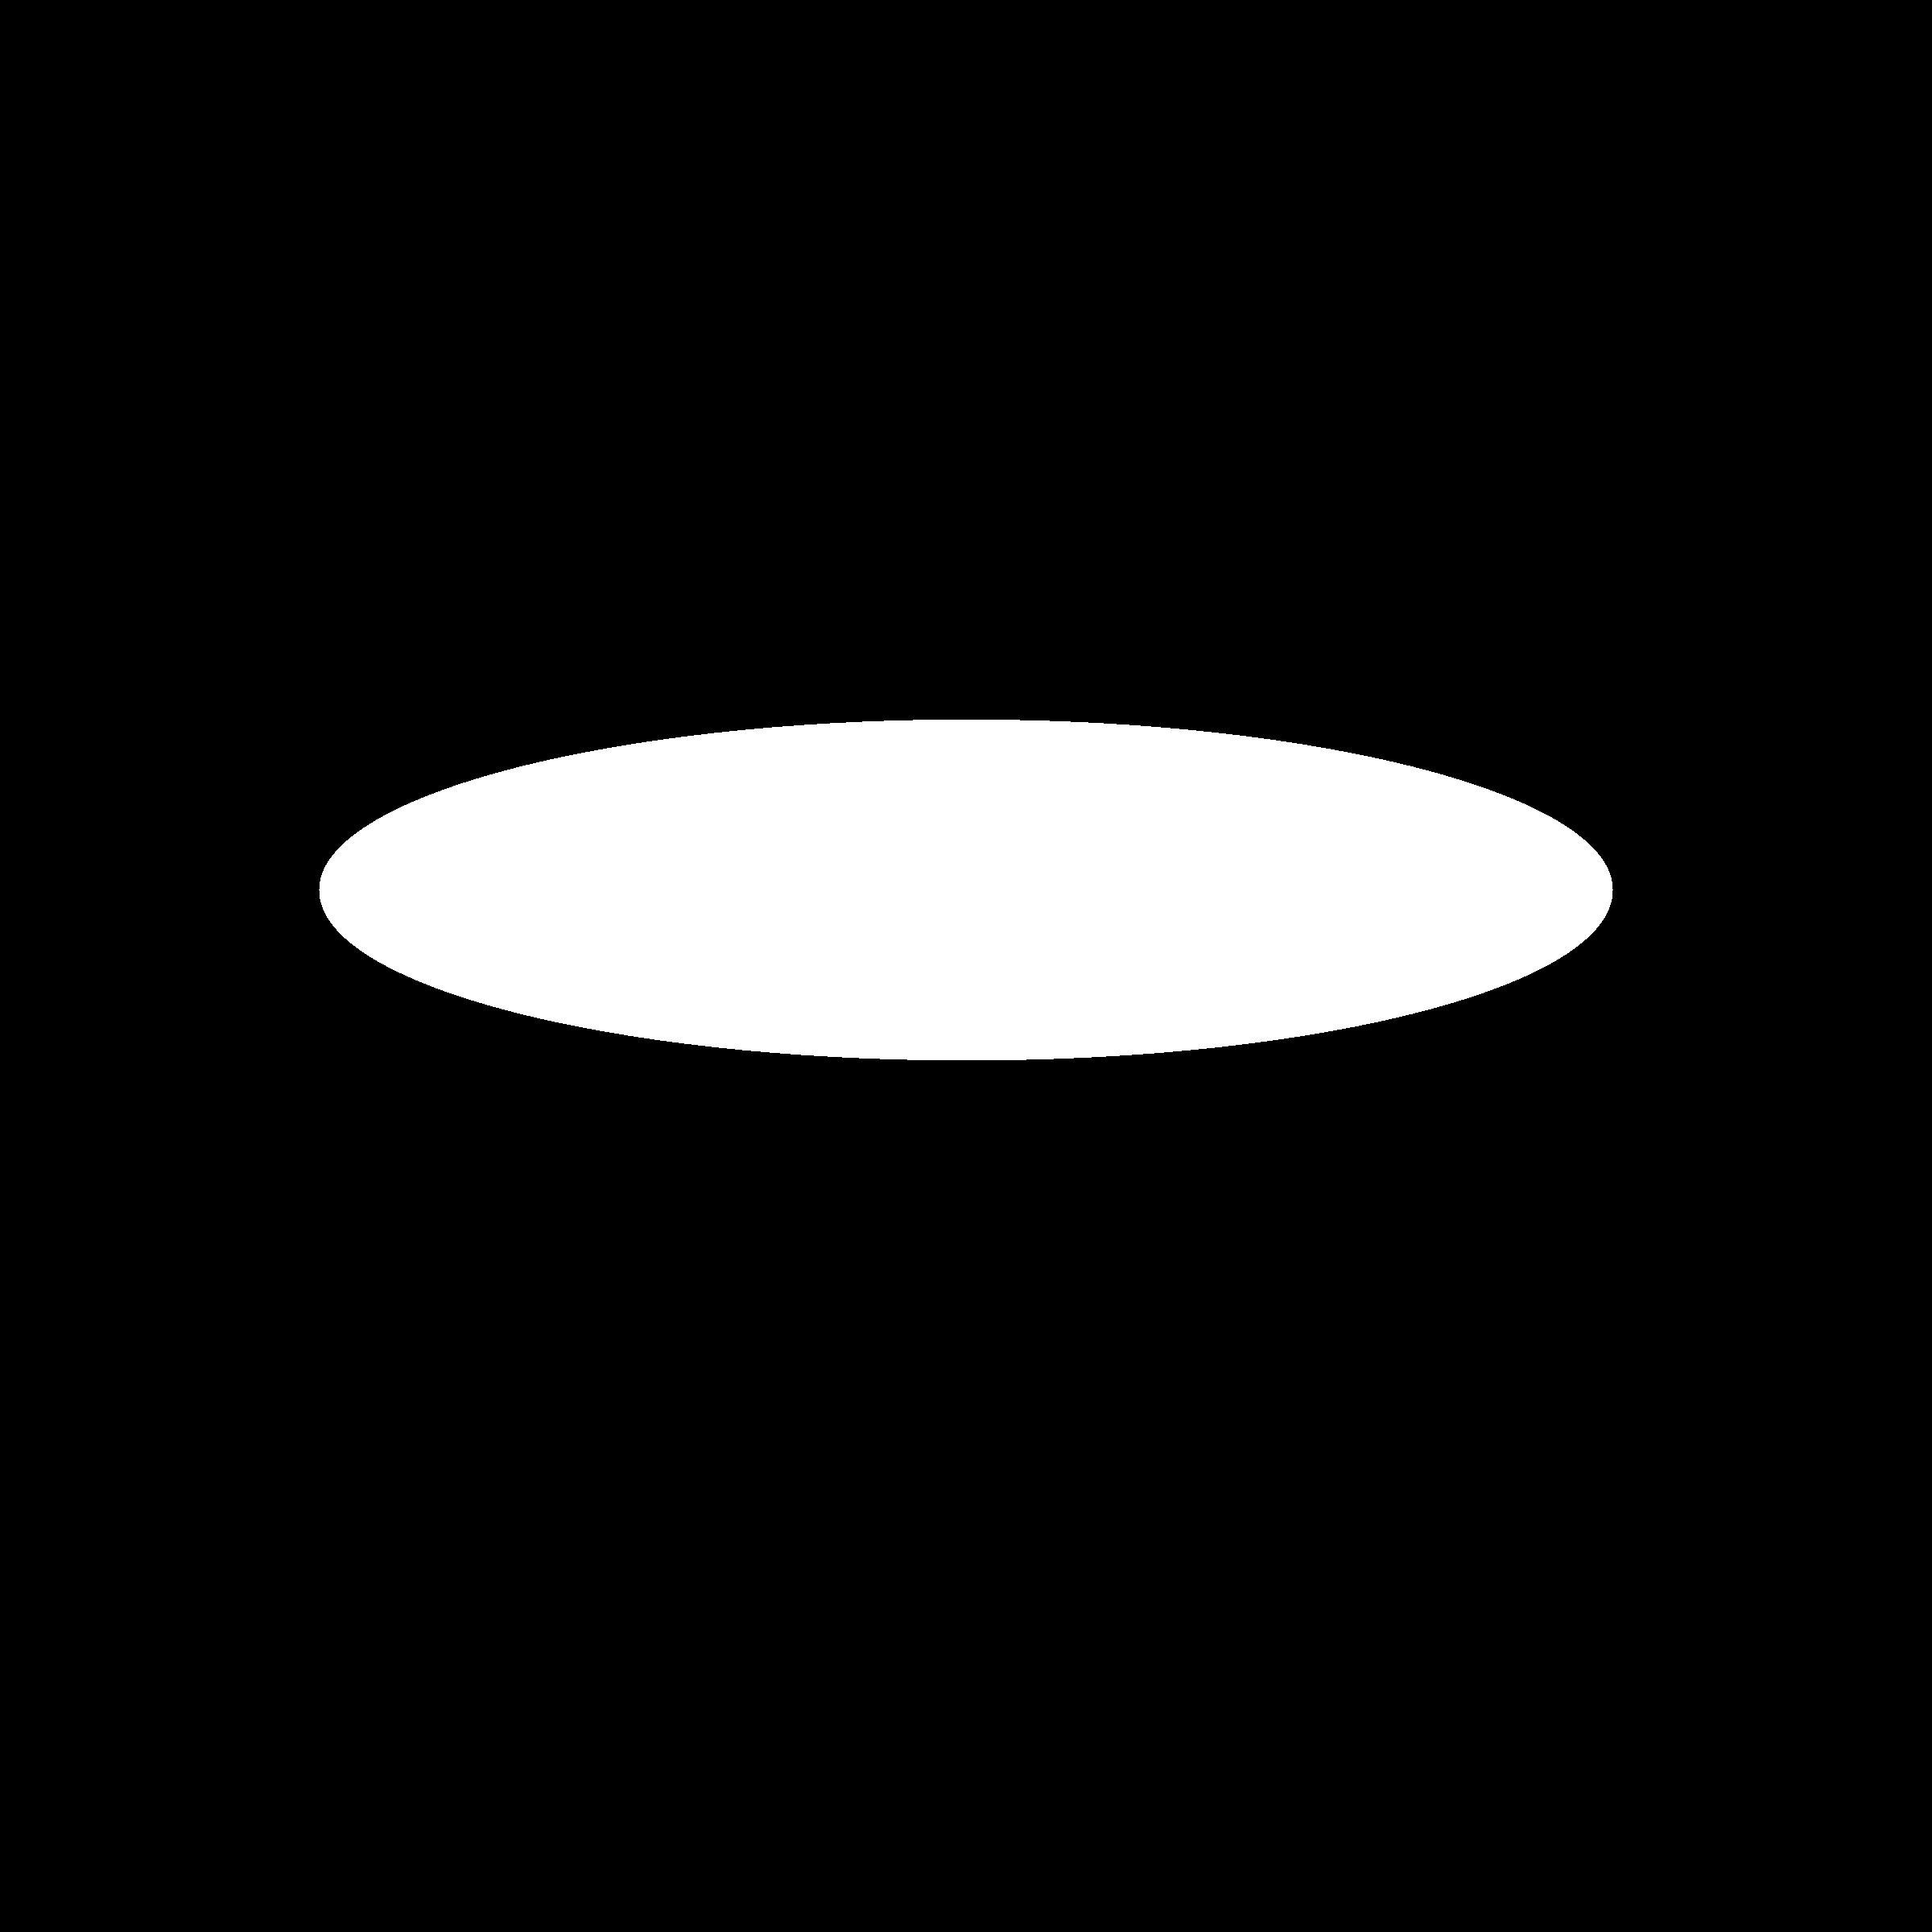 Radeon Graphics Logo Black And White